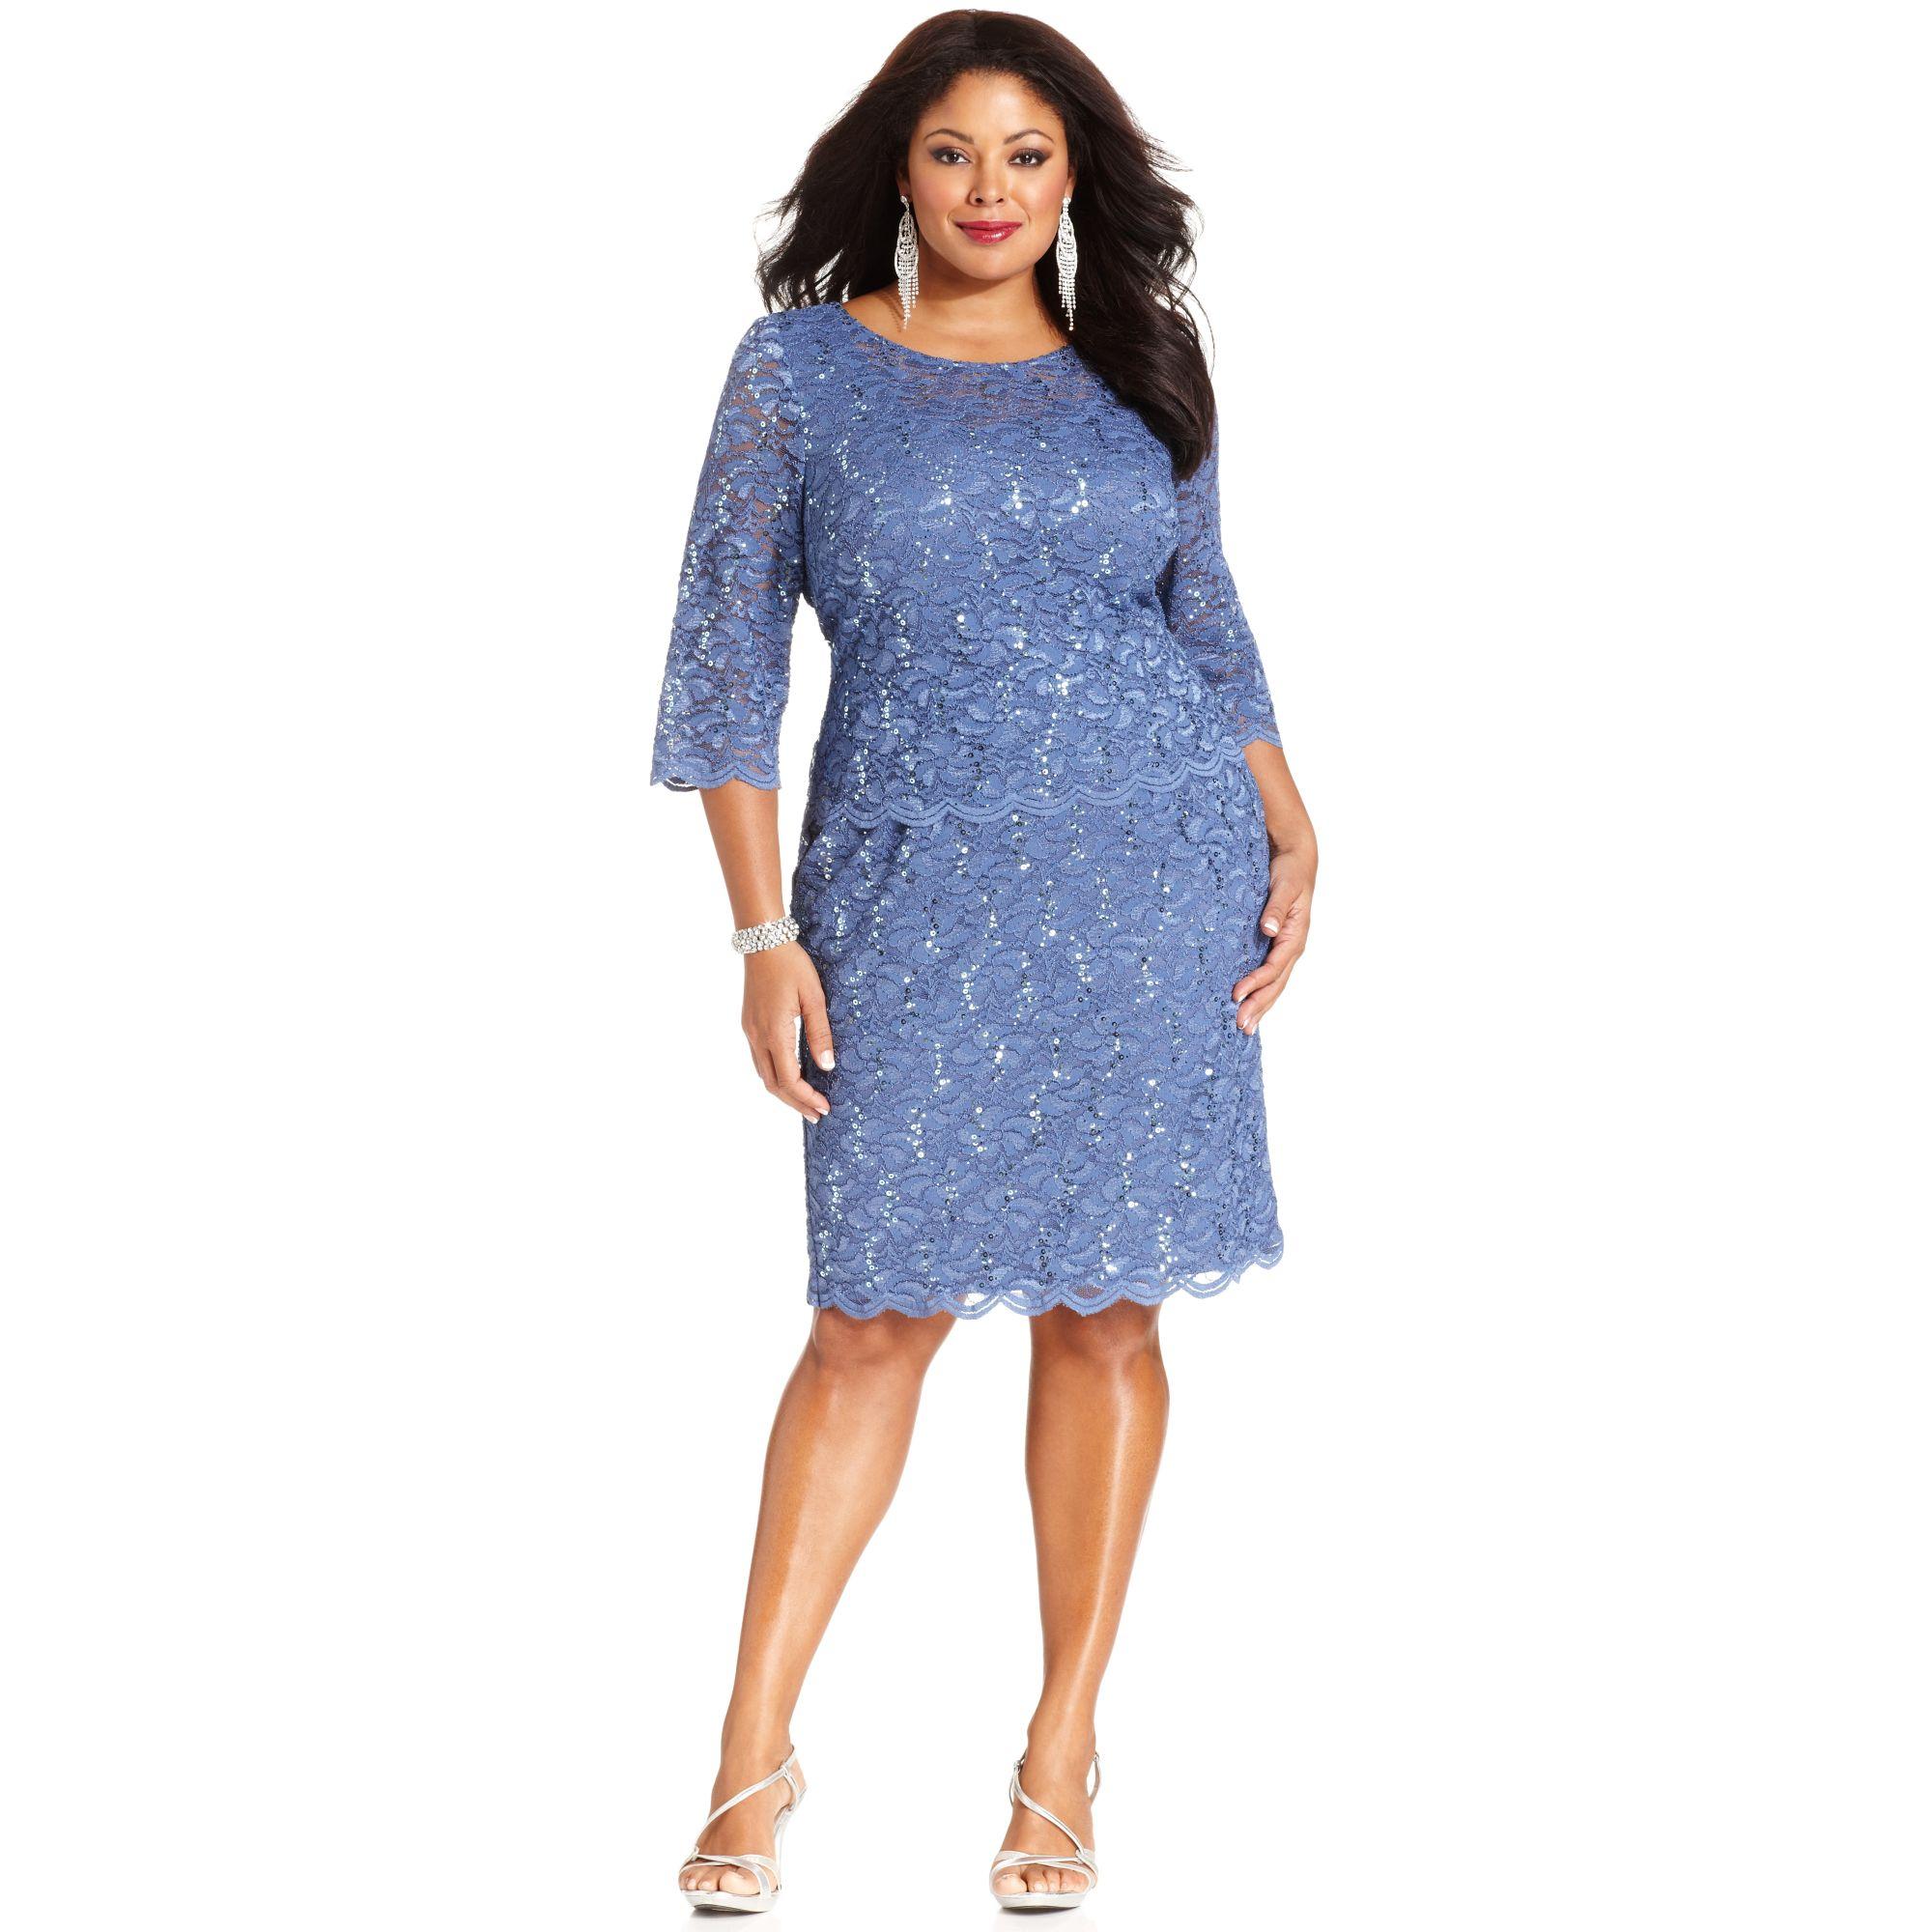 Macys Summer Dresses Plus Size